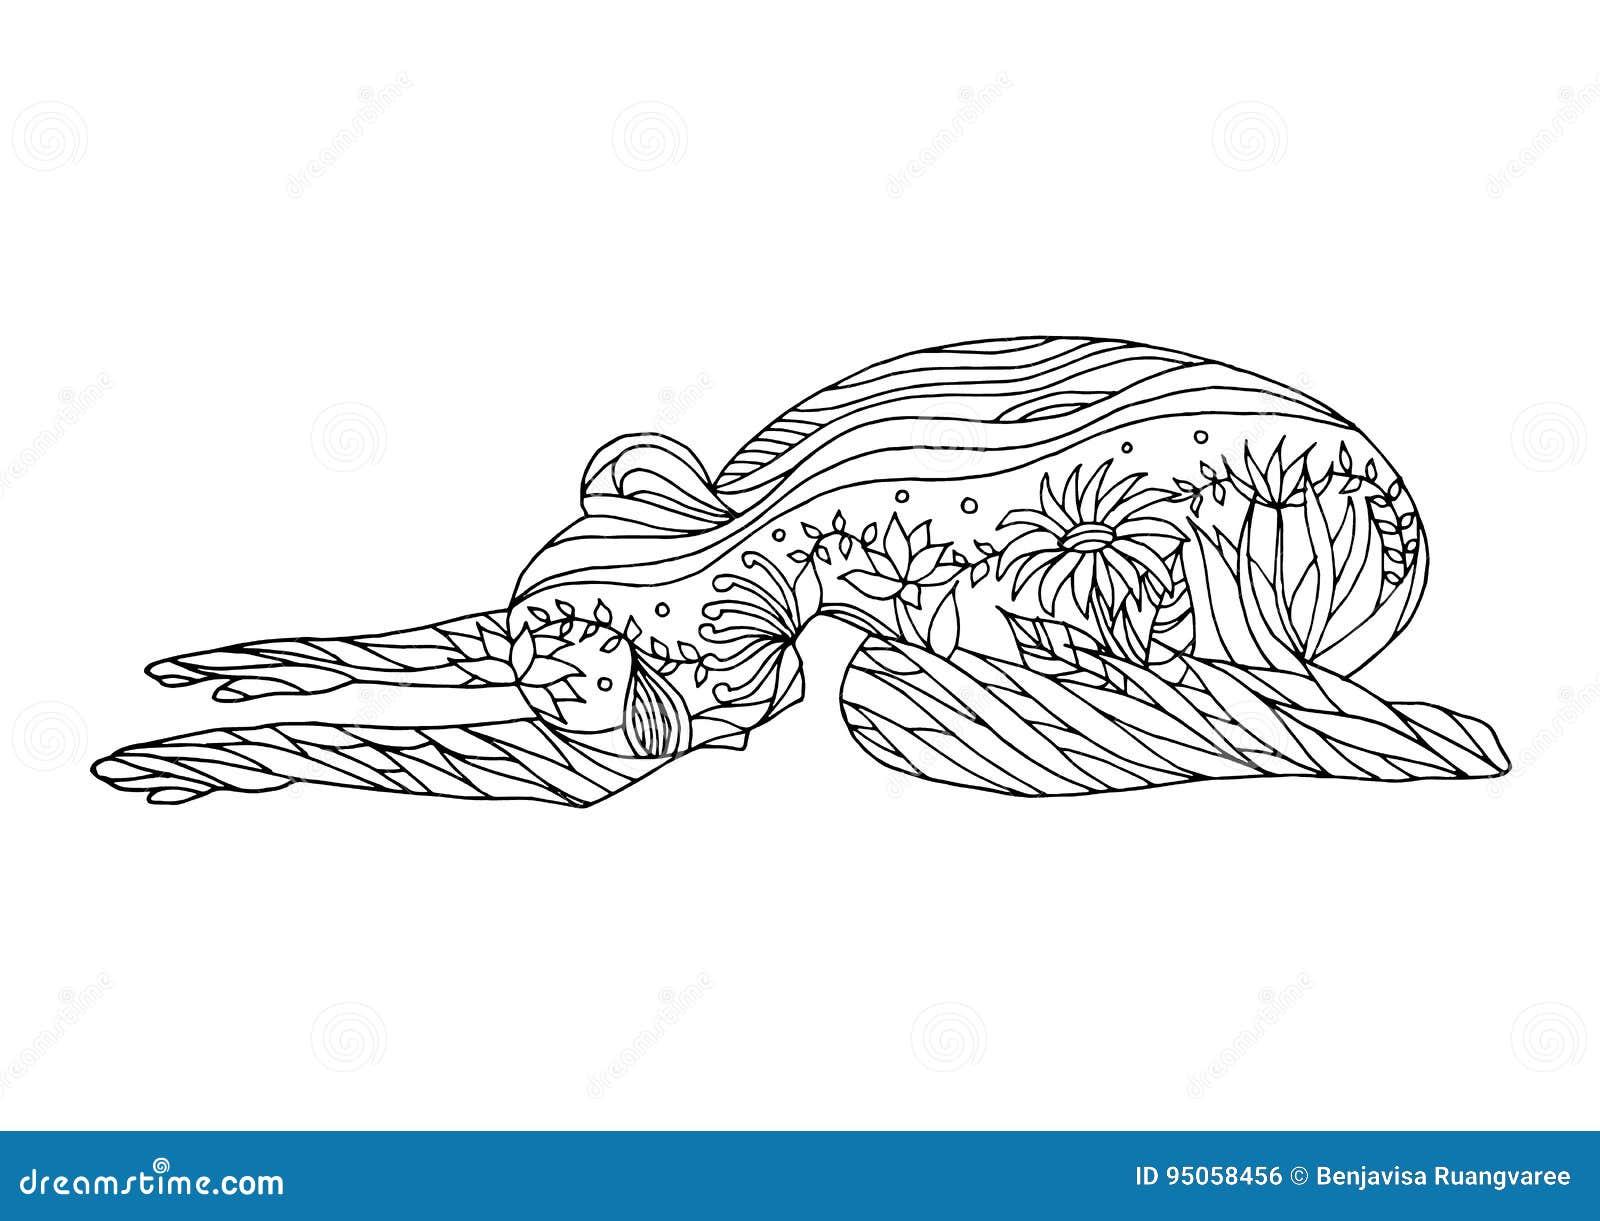 Balasana Drawing